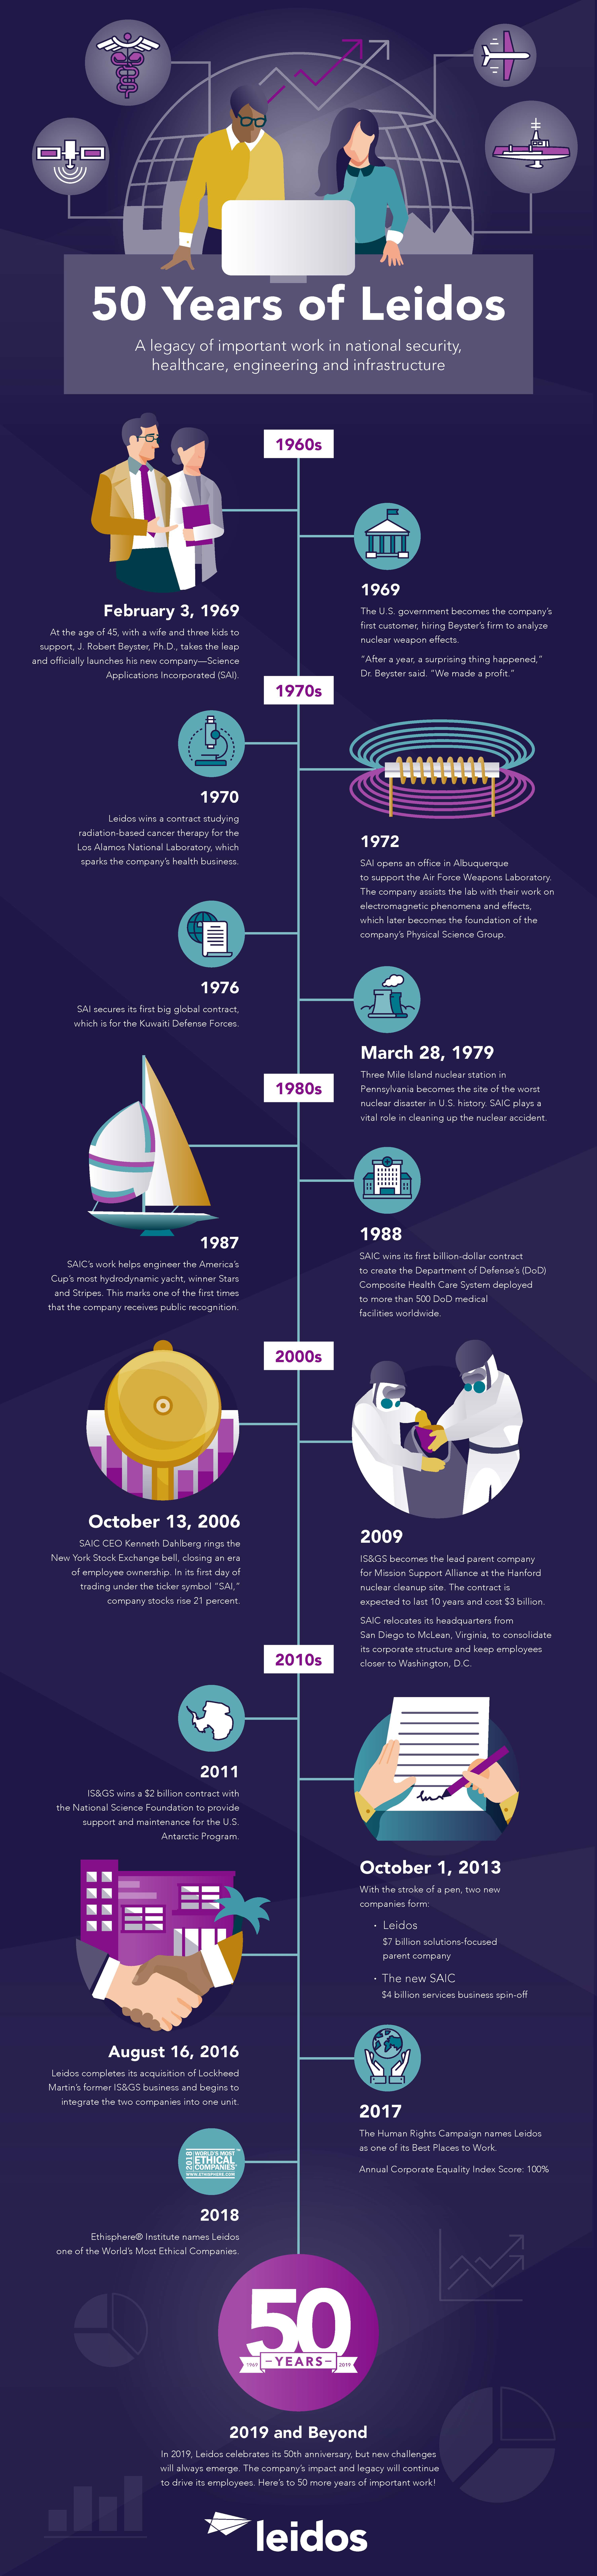 50 Years of Leidos Timeline